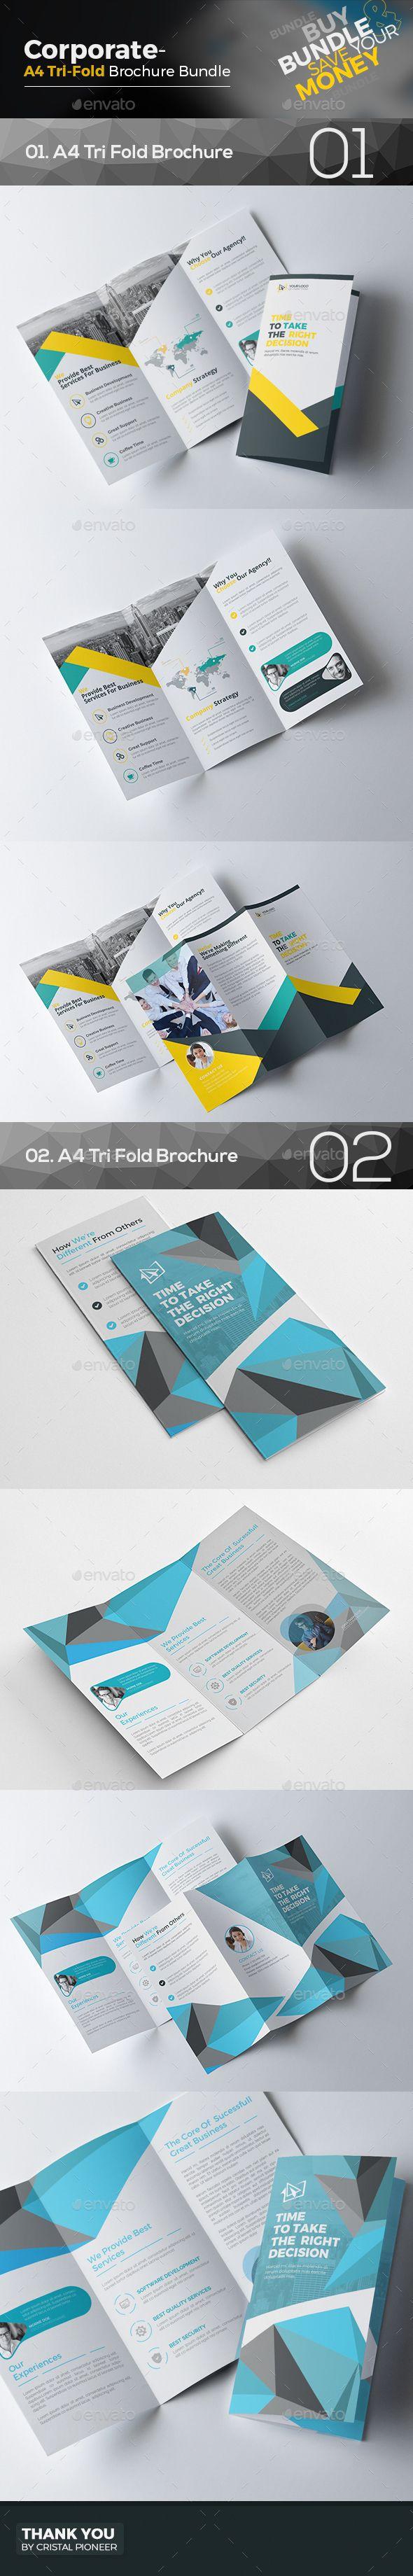 2 Tri Fold Brochure Templates Vector EPS, AI Illustrator. Download here: https://graphicriver.net/item/tri-fold-brochure-bundle-2-in-1/17255266?ref=ksioks